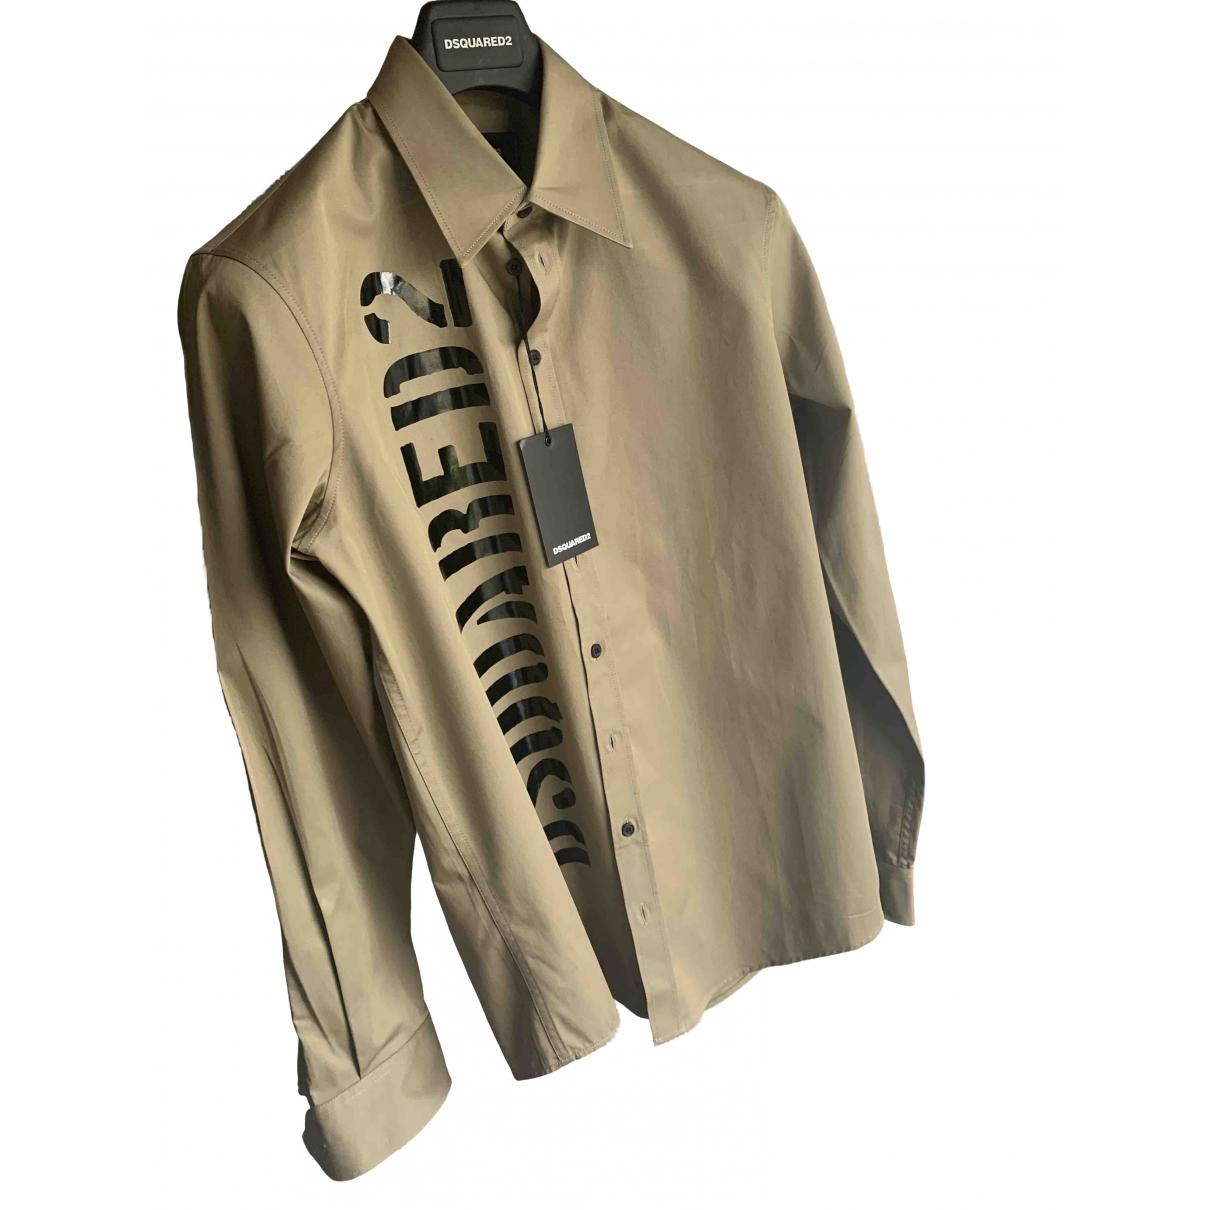 Dsquared2 \N Khaki Cotton Shirts for Men S International